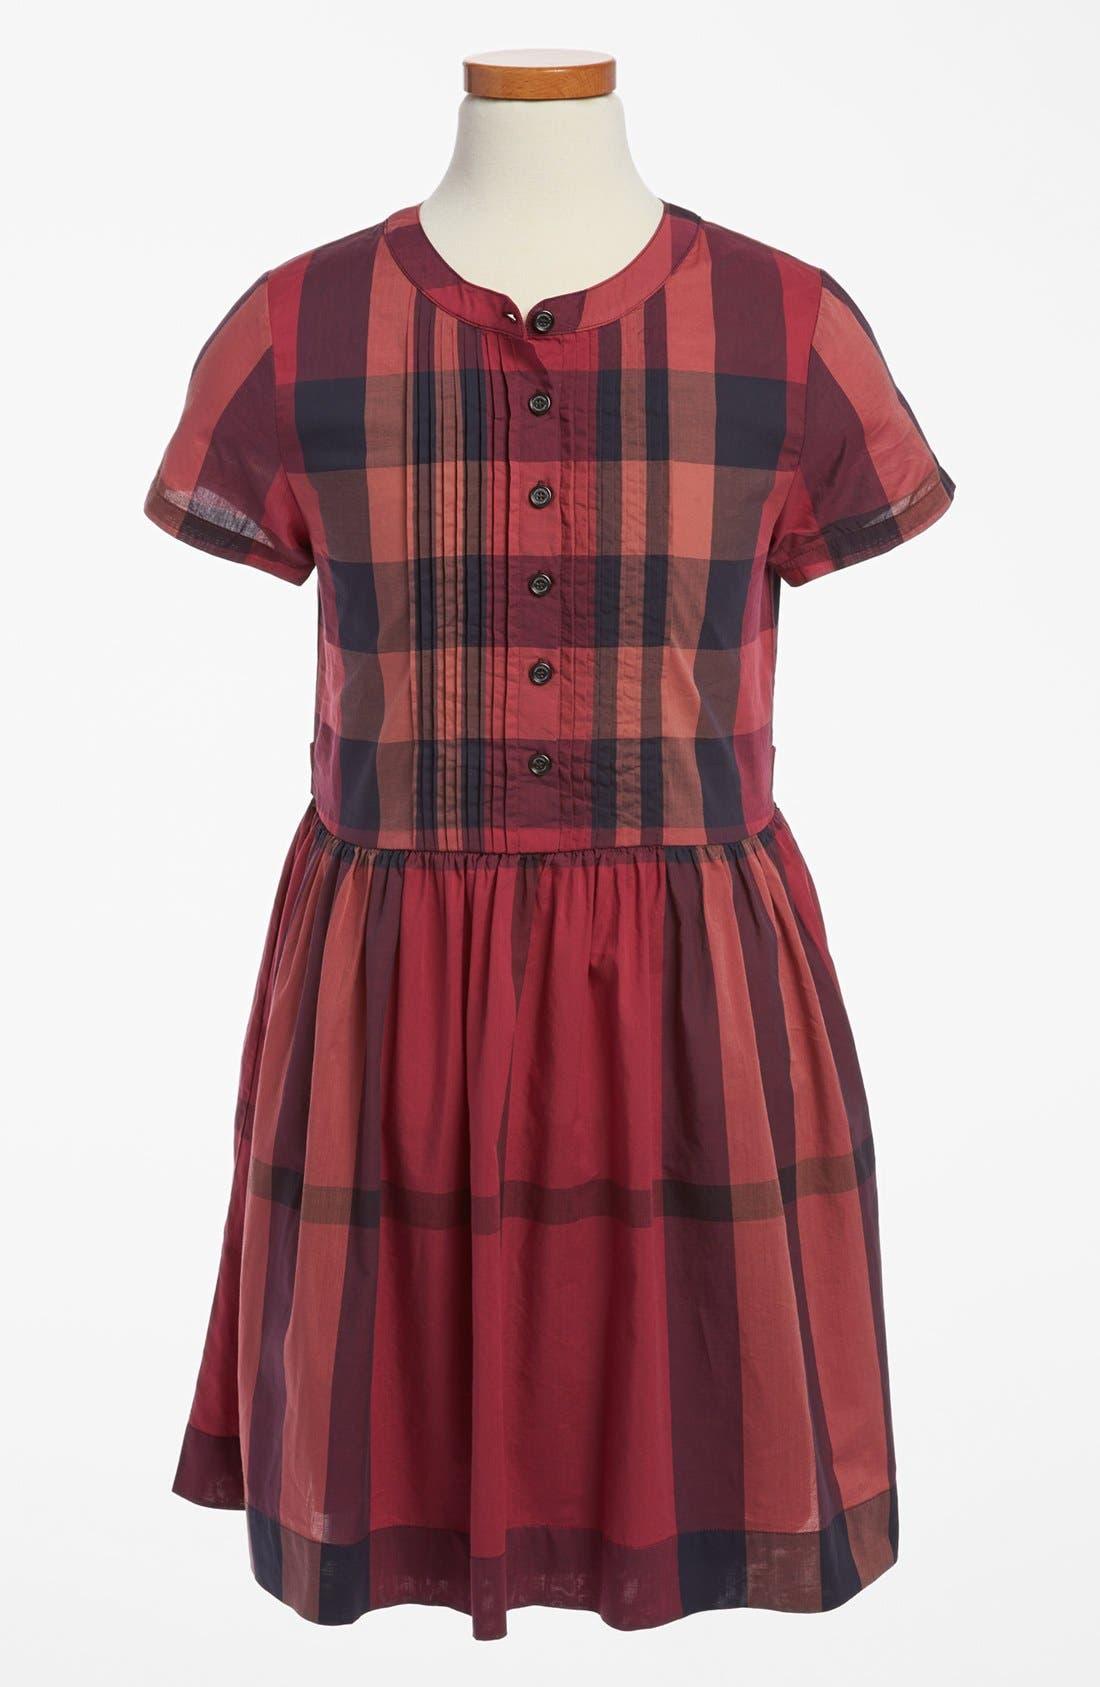 Alternate Image 1 Selected - Burberry 'Dally' Dress (Little Girls & Big Girls)